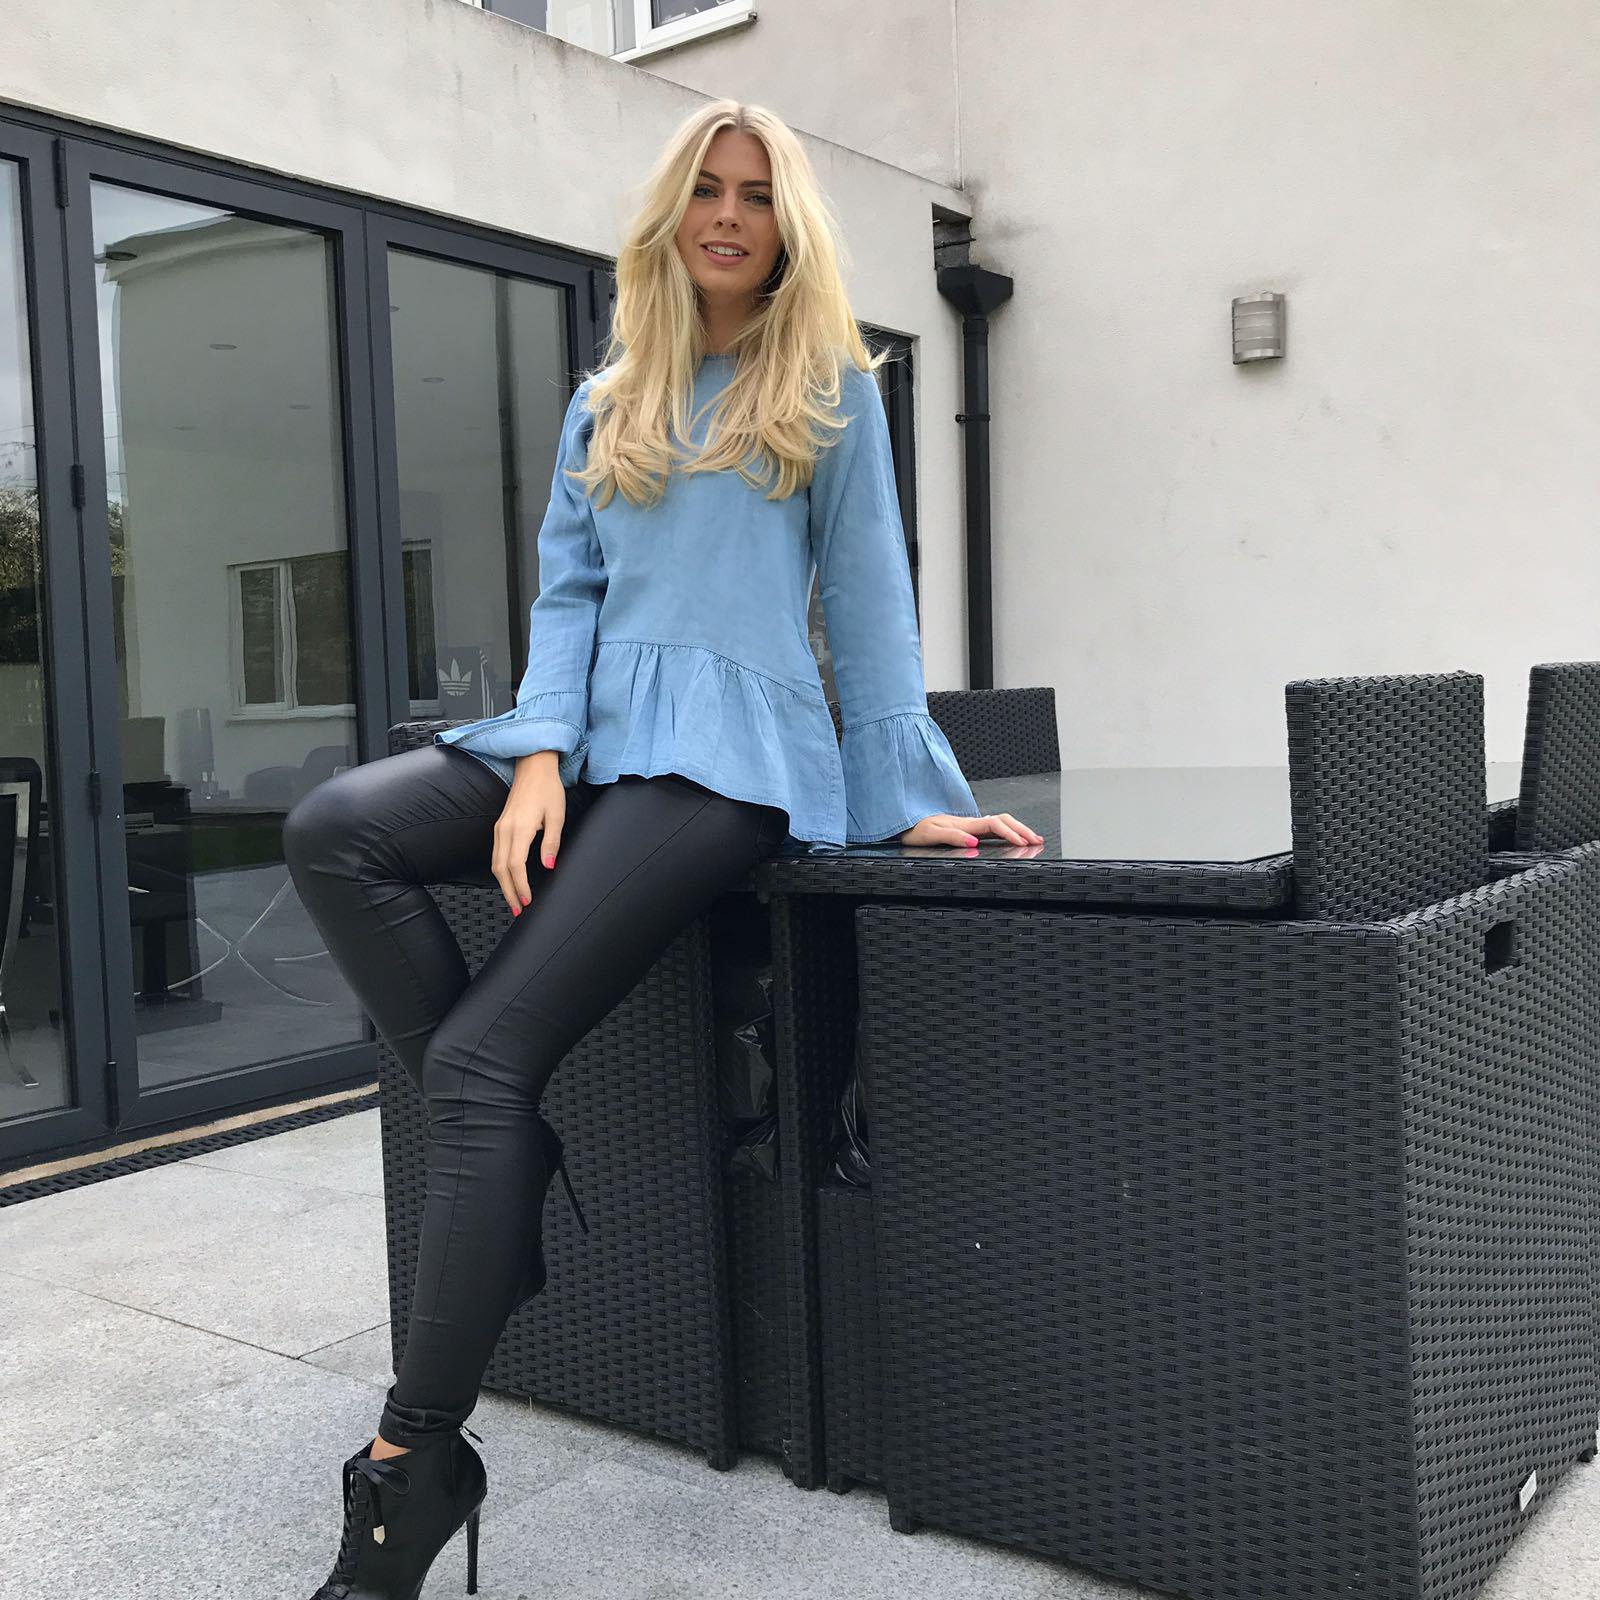 f6d0e1f9e37 Jeans and a Nice Top: How to Dress Up Your Skinny Jeans - SilkFred Blog